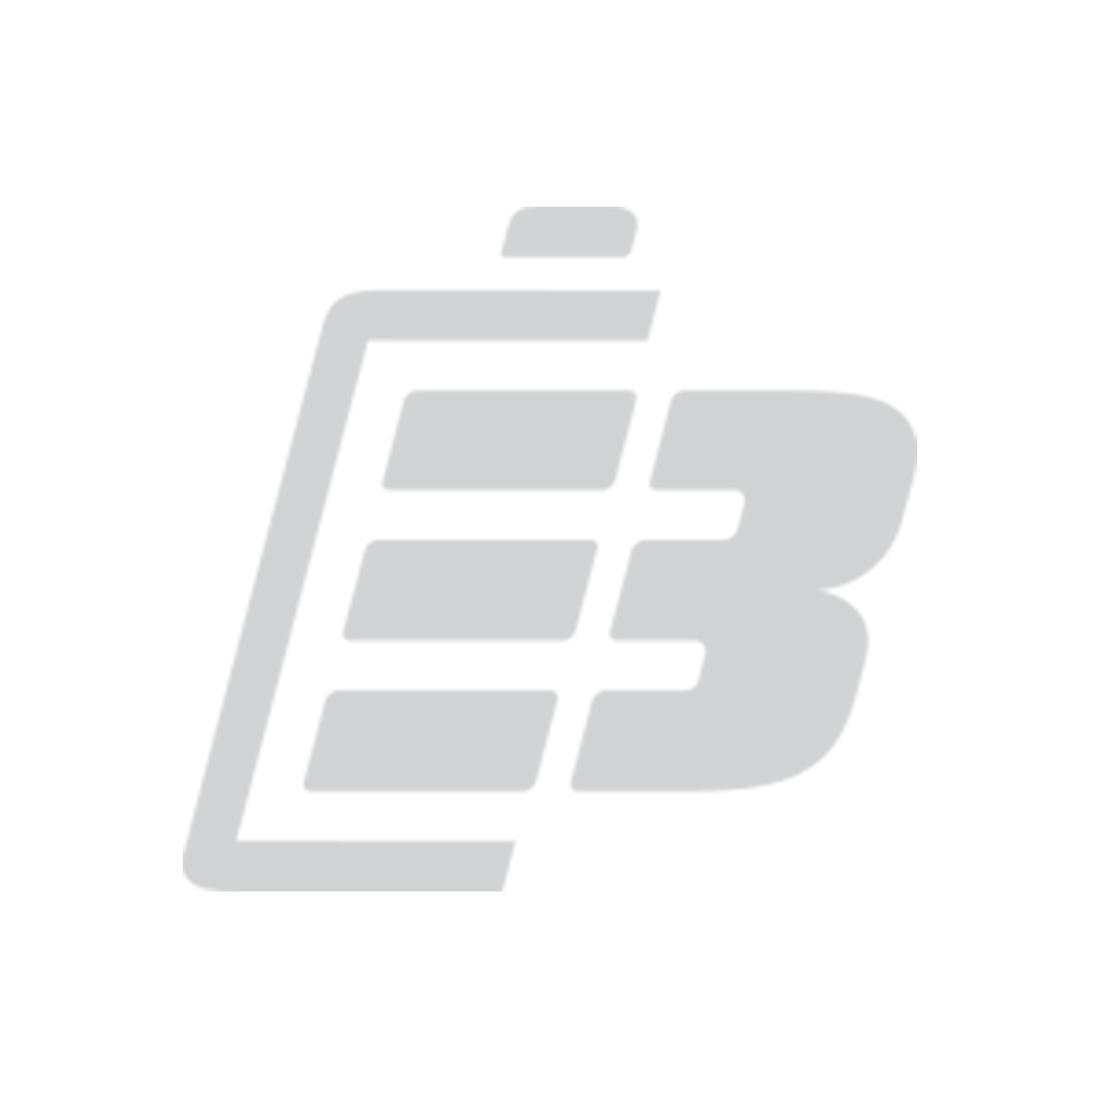 Choetech SC003-V1 Solar Charger Backpack kit 24W 1